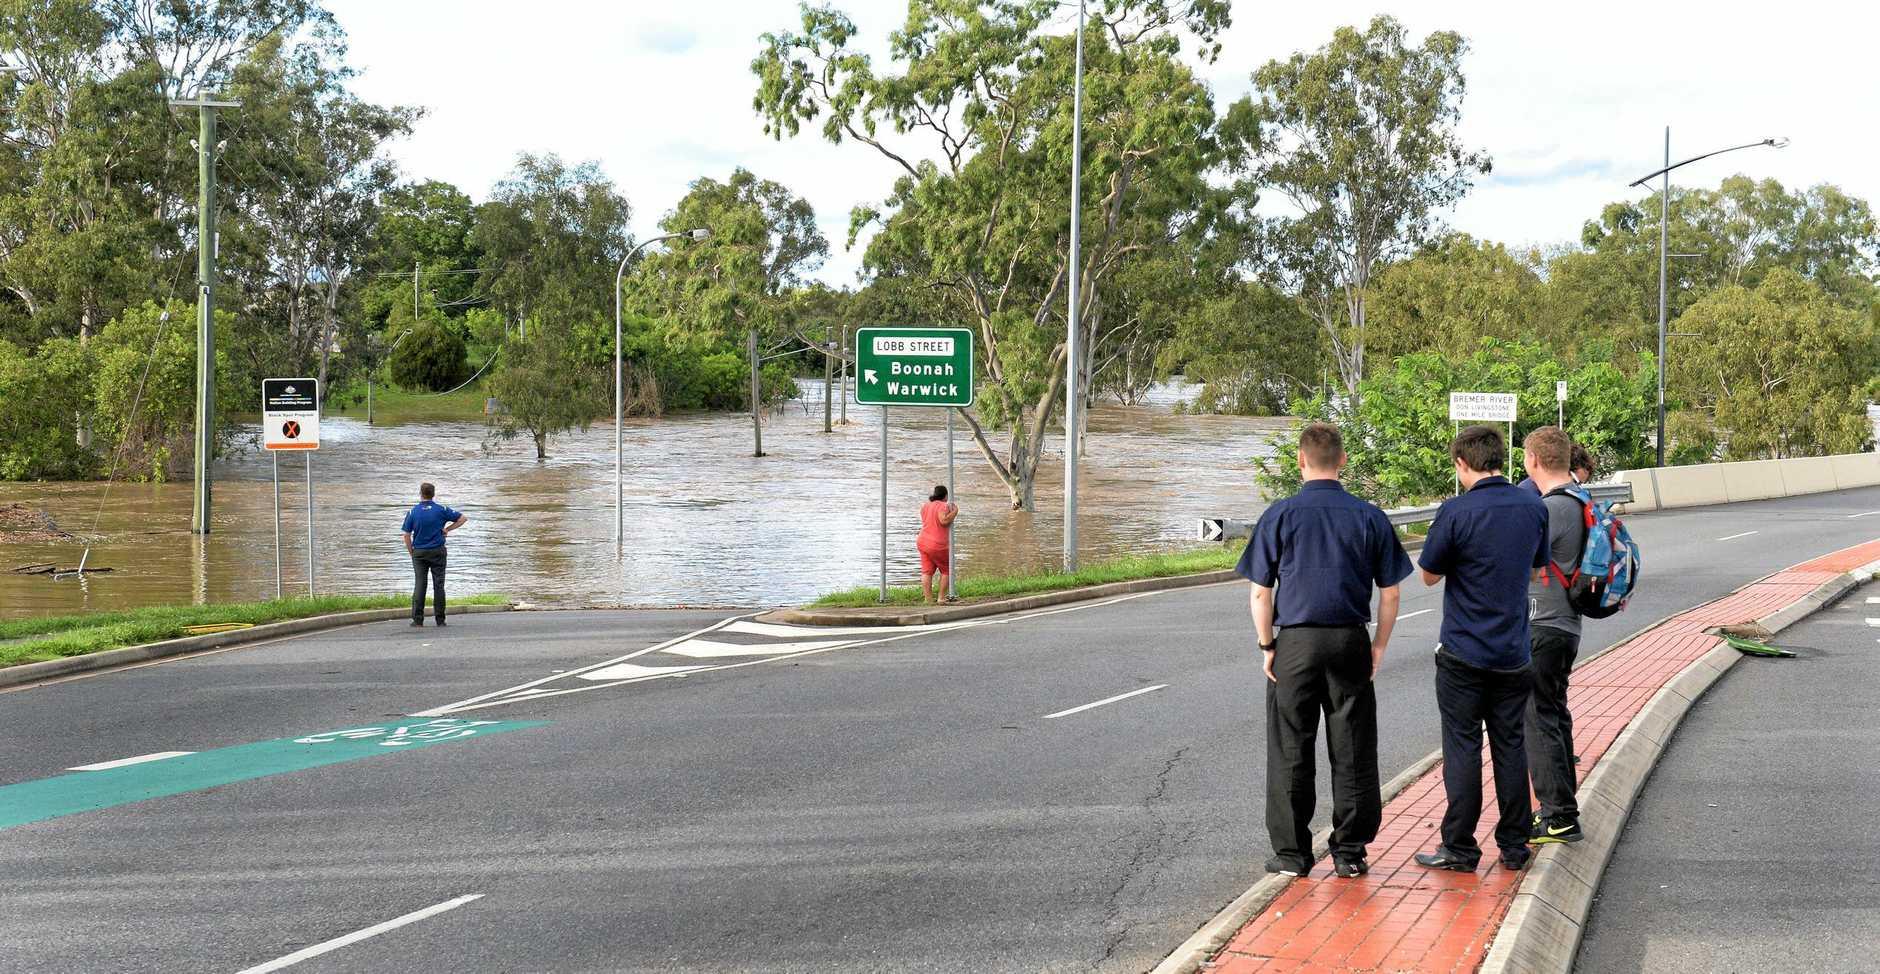 Flooding in Ipswich. One Mile Bridge.